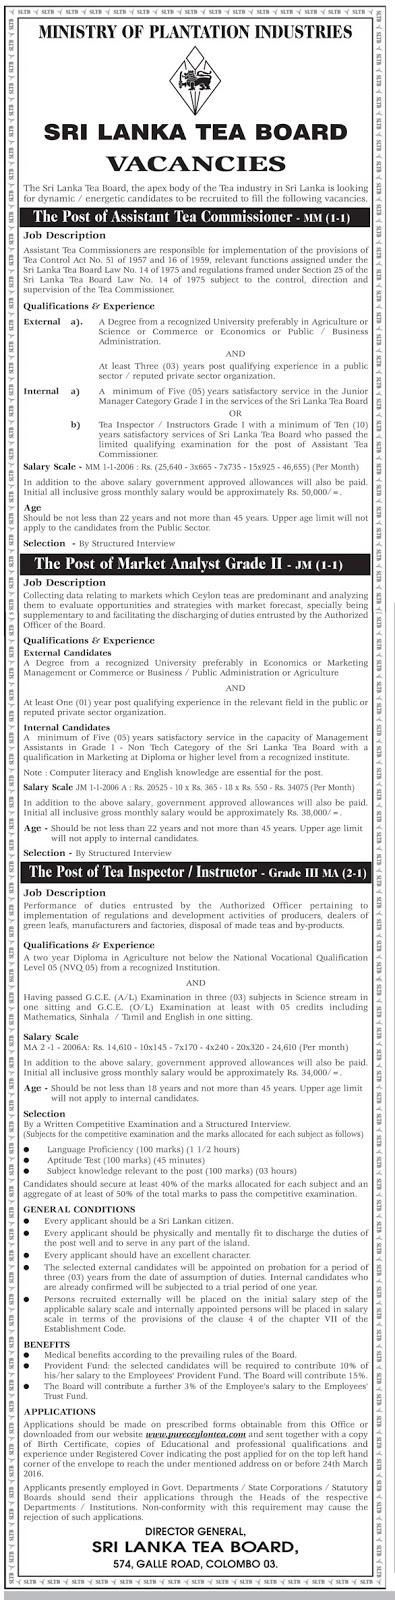 Vacancies - Assistant Tea Commissioner - Market Analyst Grade II - Tea Inspector/Instructor Grade III - Sri Lanka Tea Board - Ministry of Plantation Industries